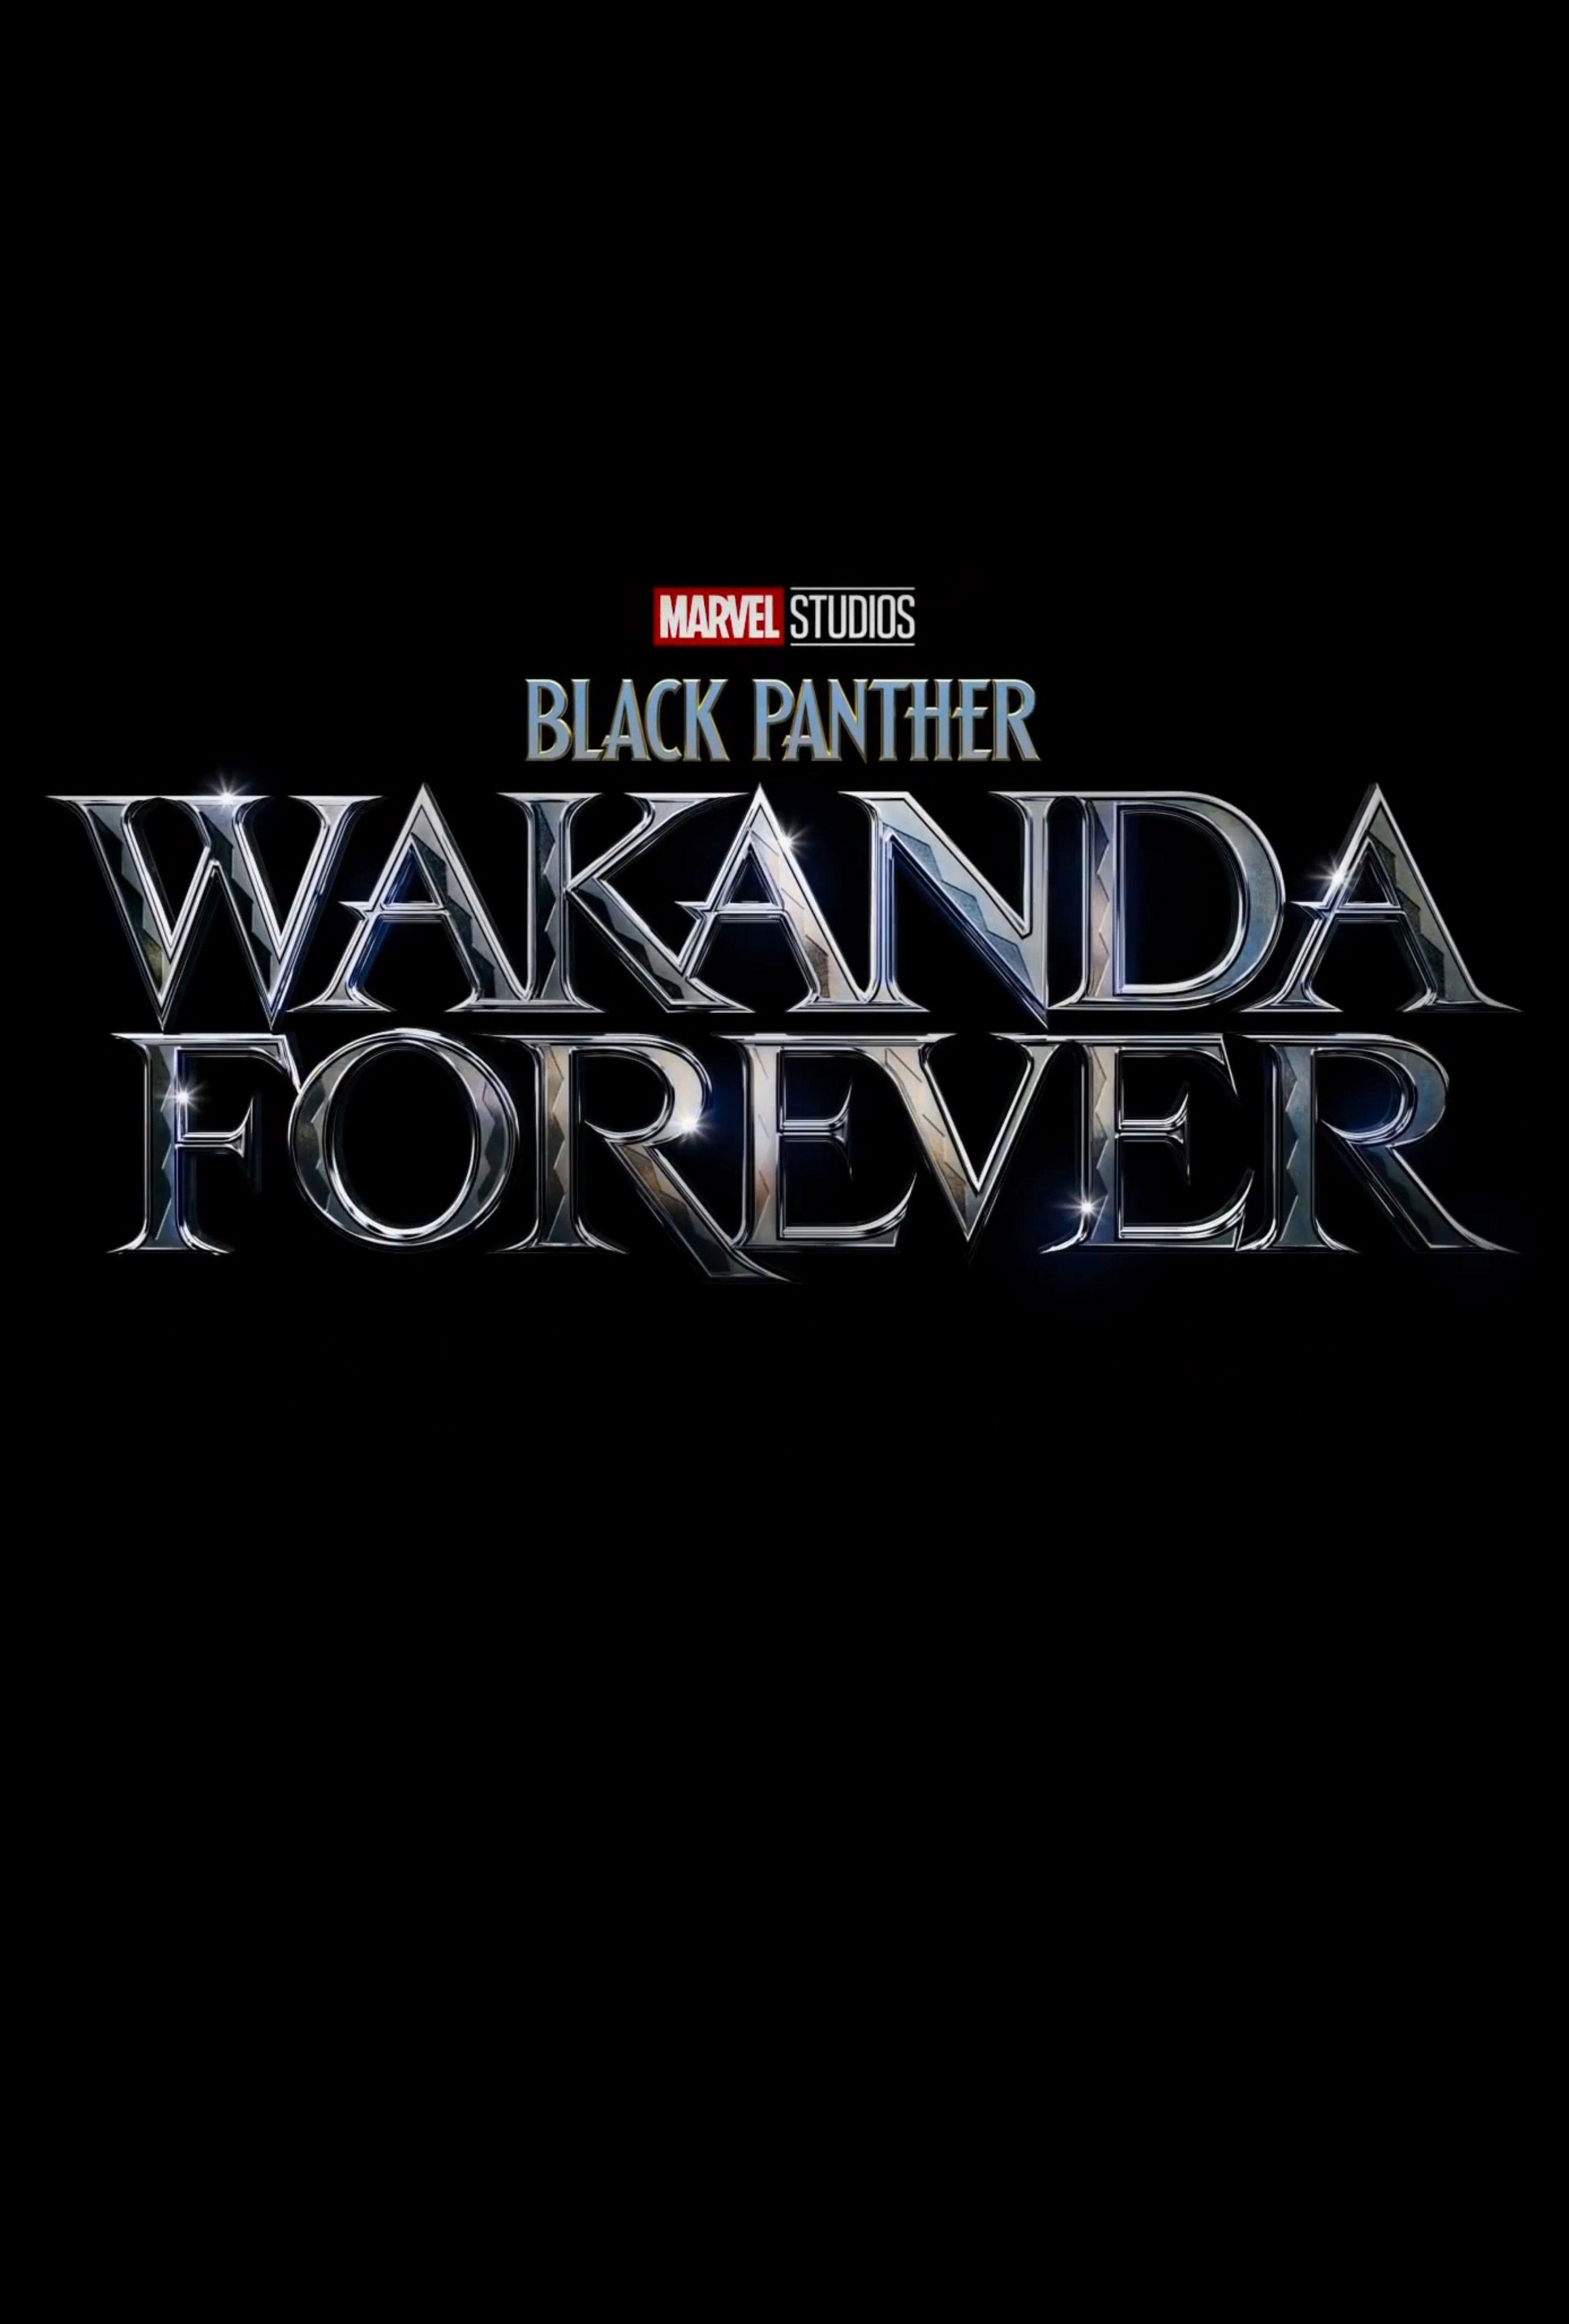 Phim Black Panther 2 Wakanda Forever - Black Panther: Wakanda Forever (2022)